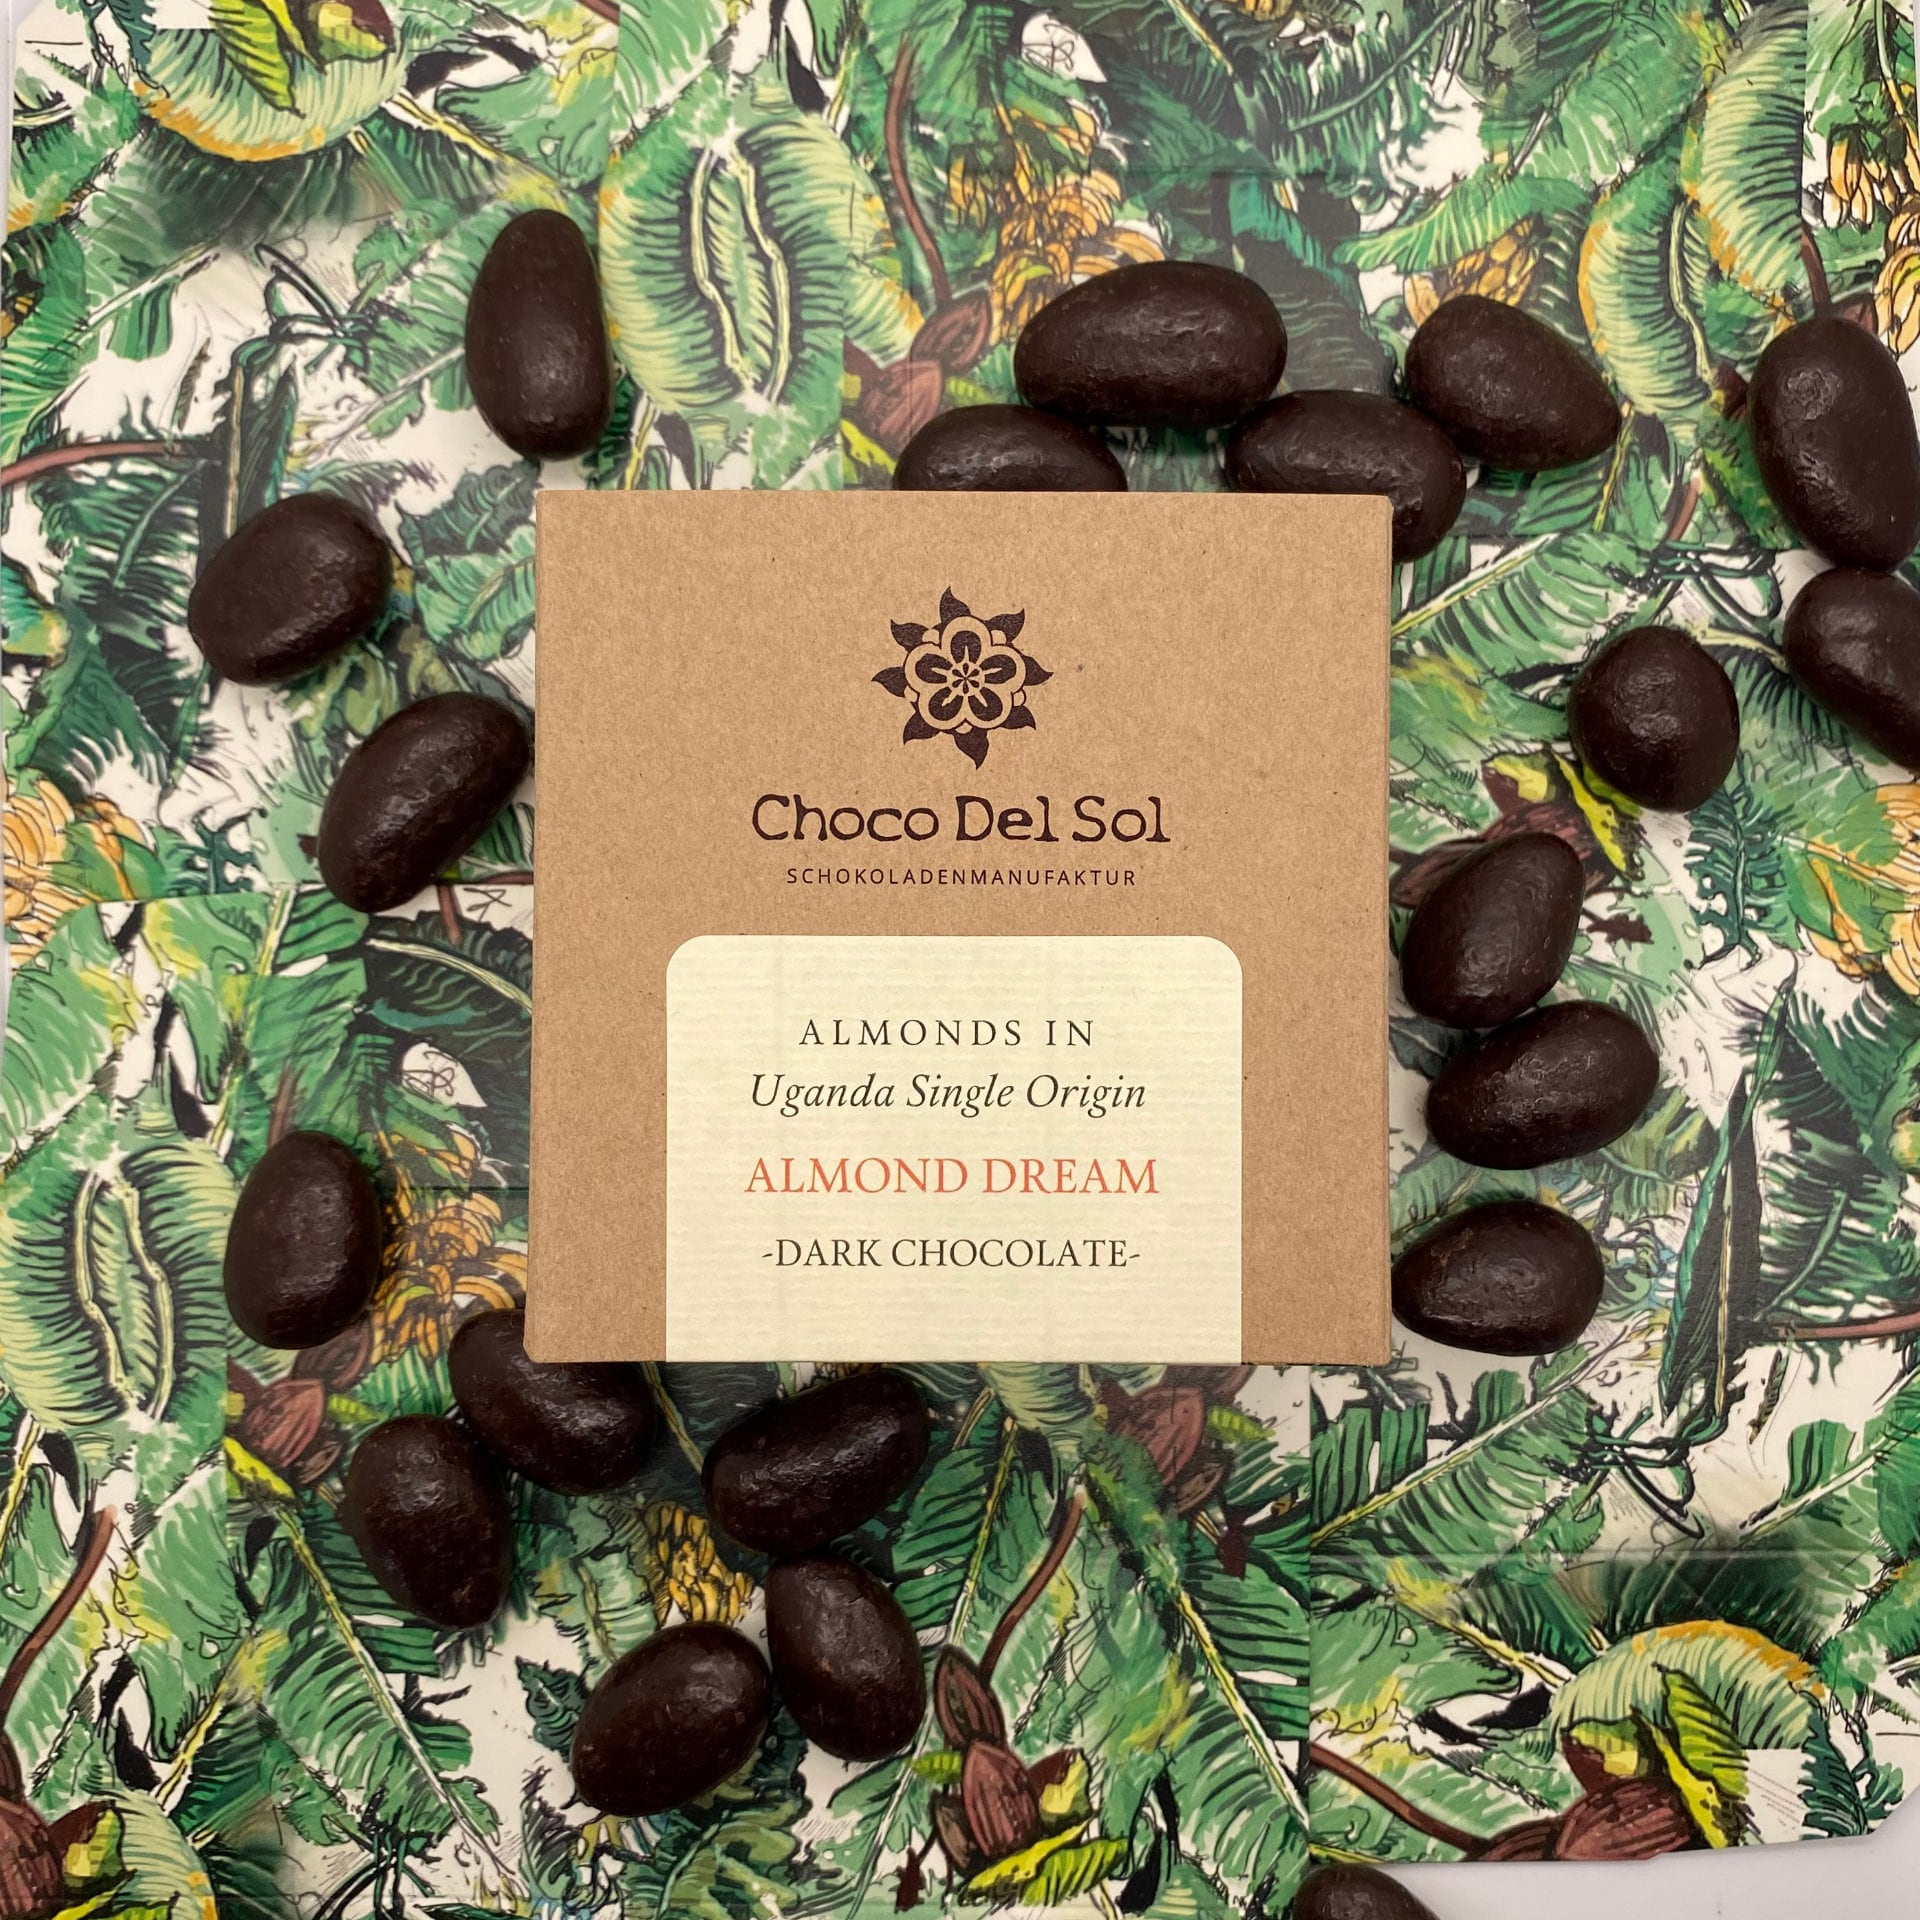 CHOCO DEL SOL | Schokoladendragees Kakaobohnen & Schokolade »Happy Beans Dark« 78% | BIO